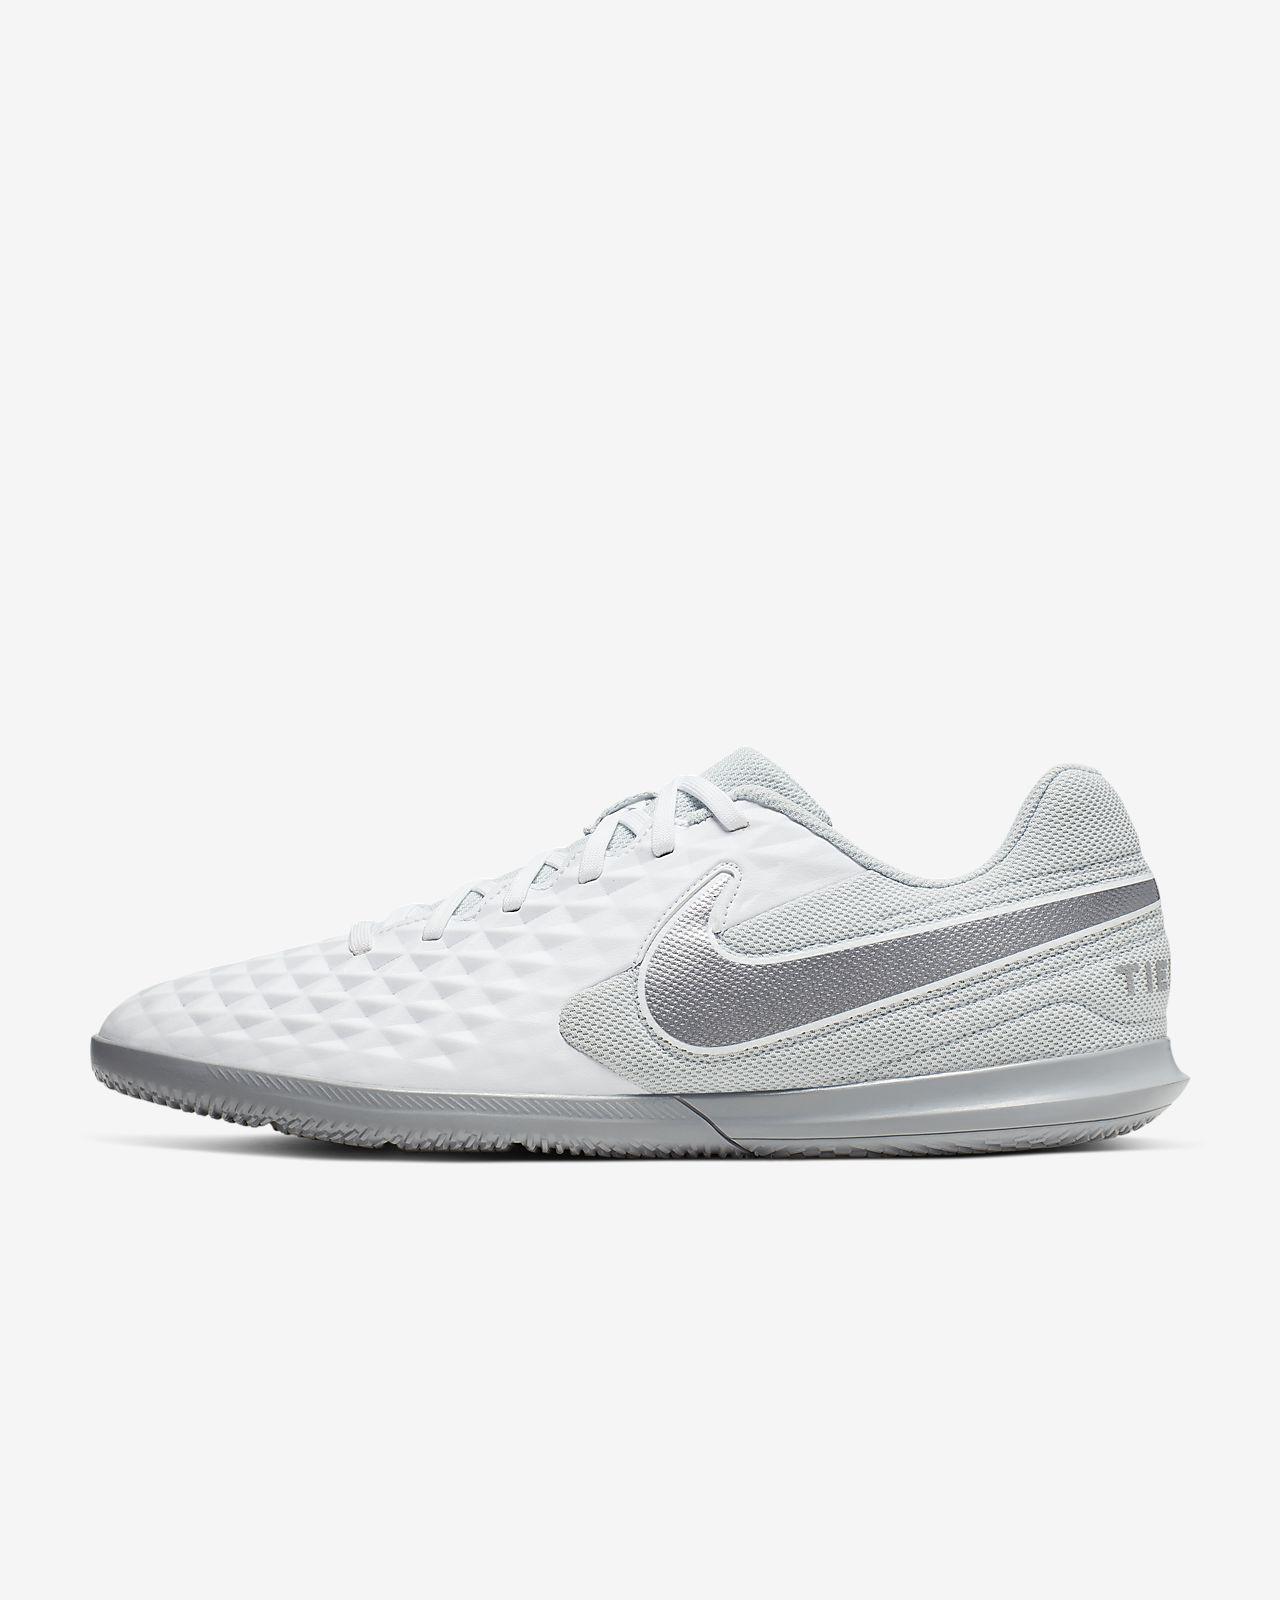 Nike Tiempo Legend 8 Club IC Indoor/Court Football Shoe